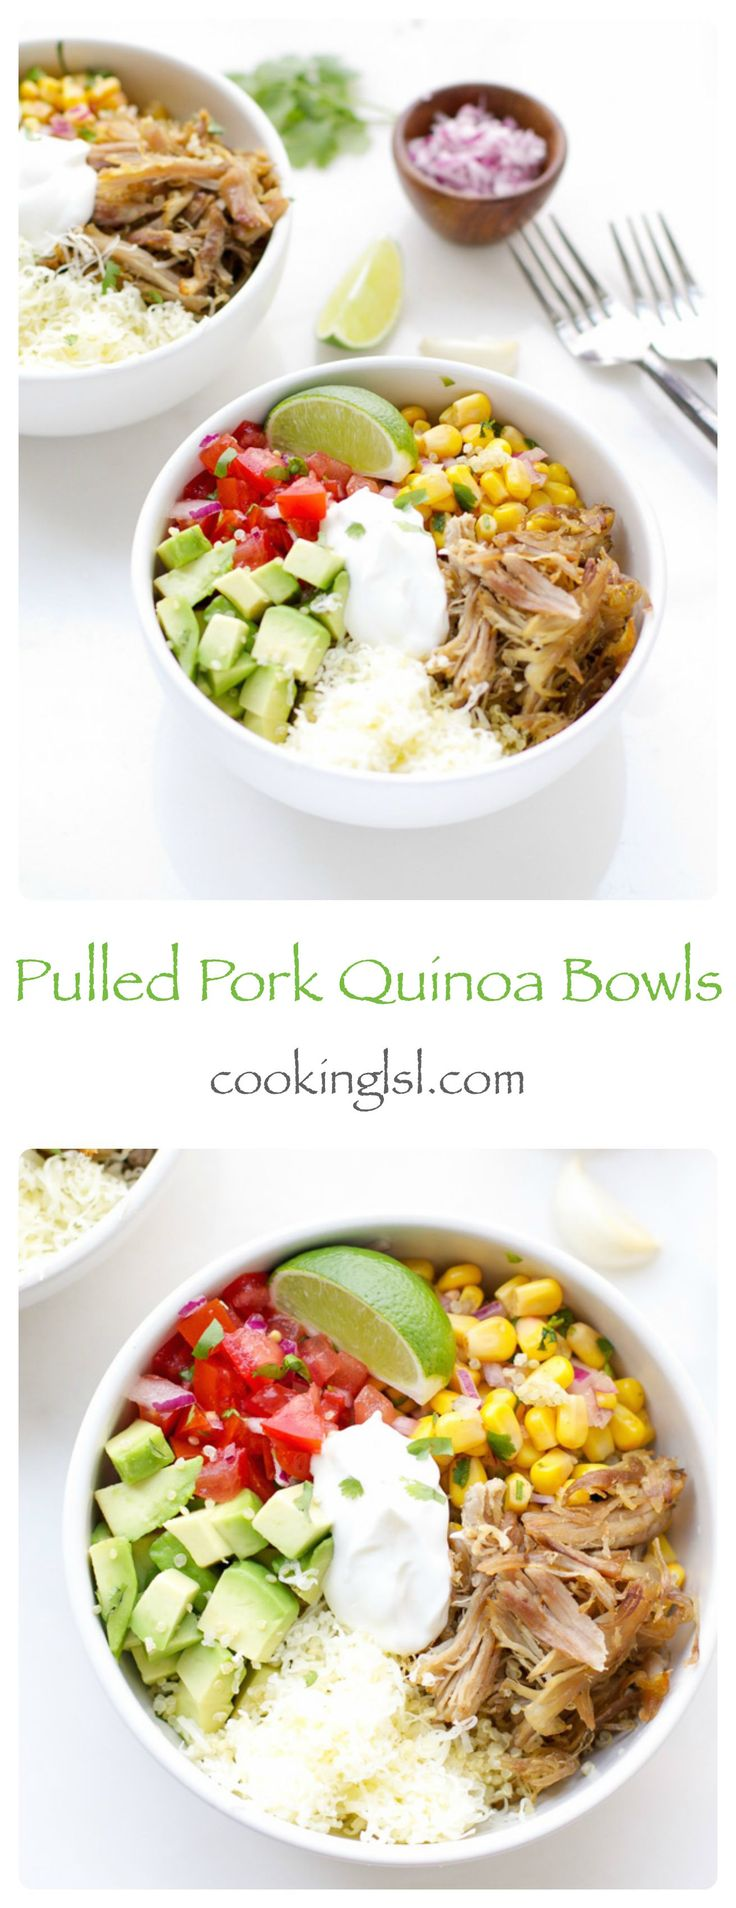 easy-dinner-ideas-pulled-pork-quinoa-bowls-carnitas-Mexican